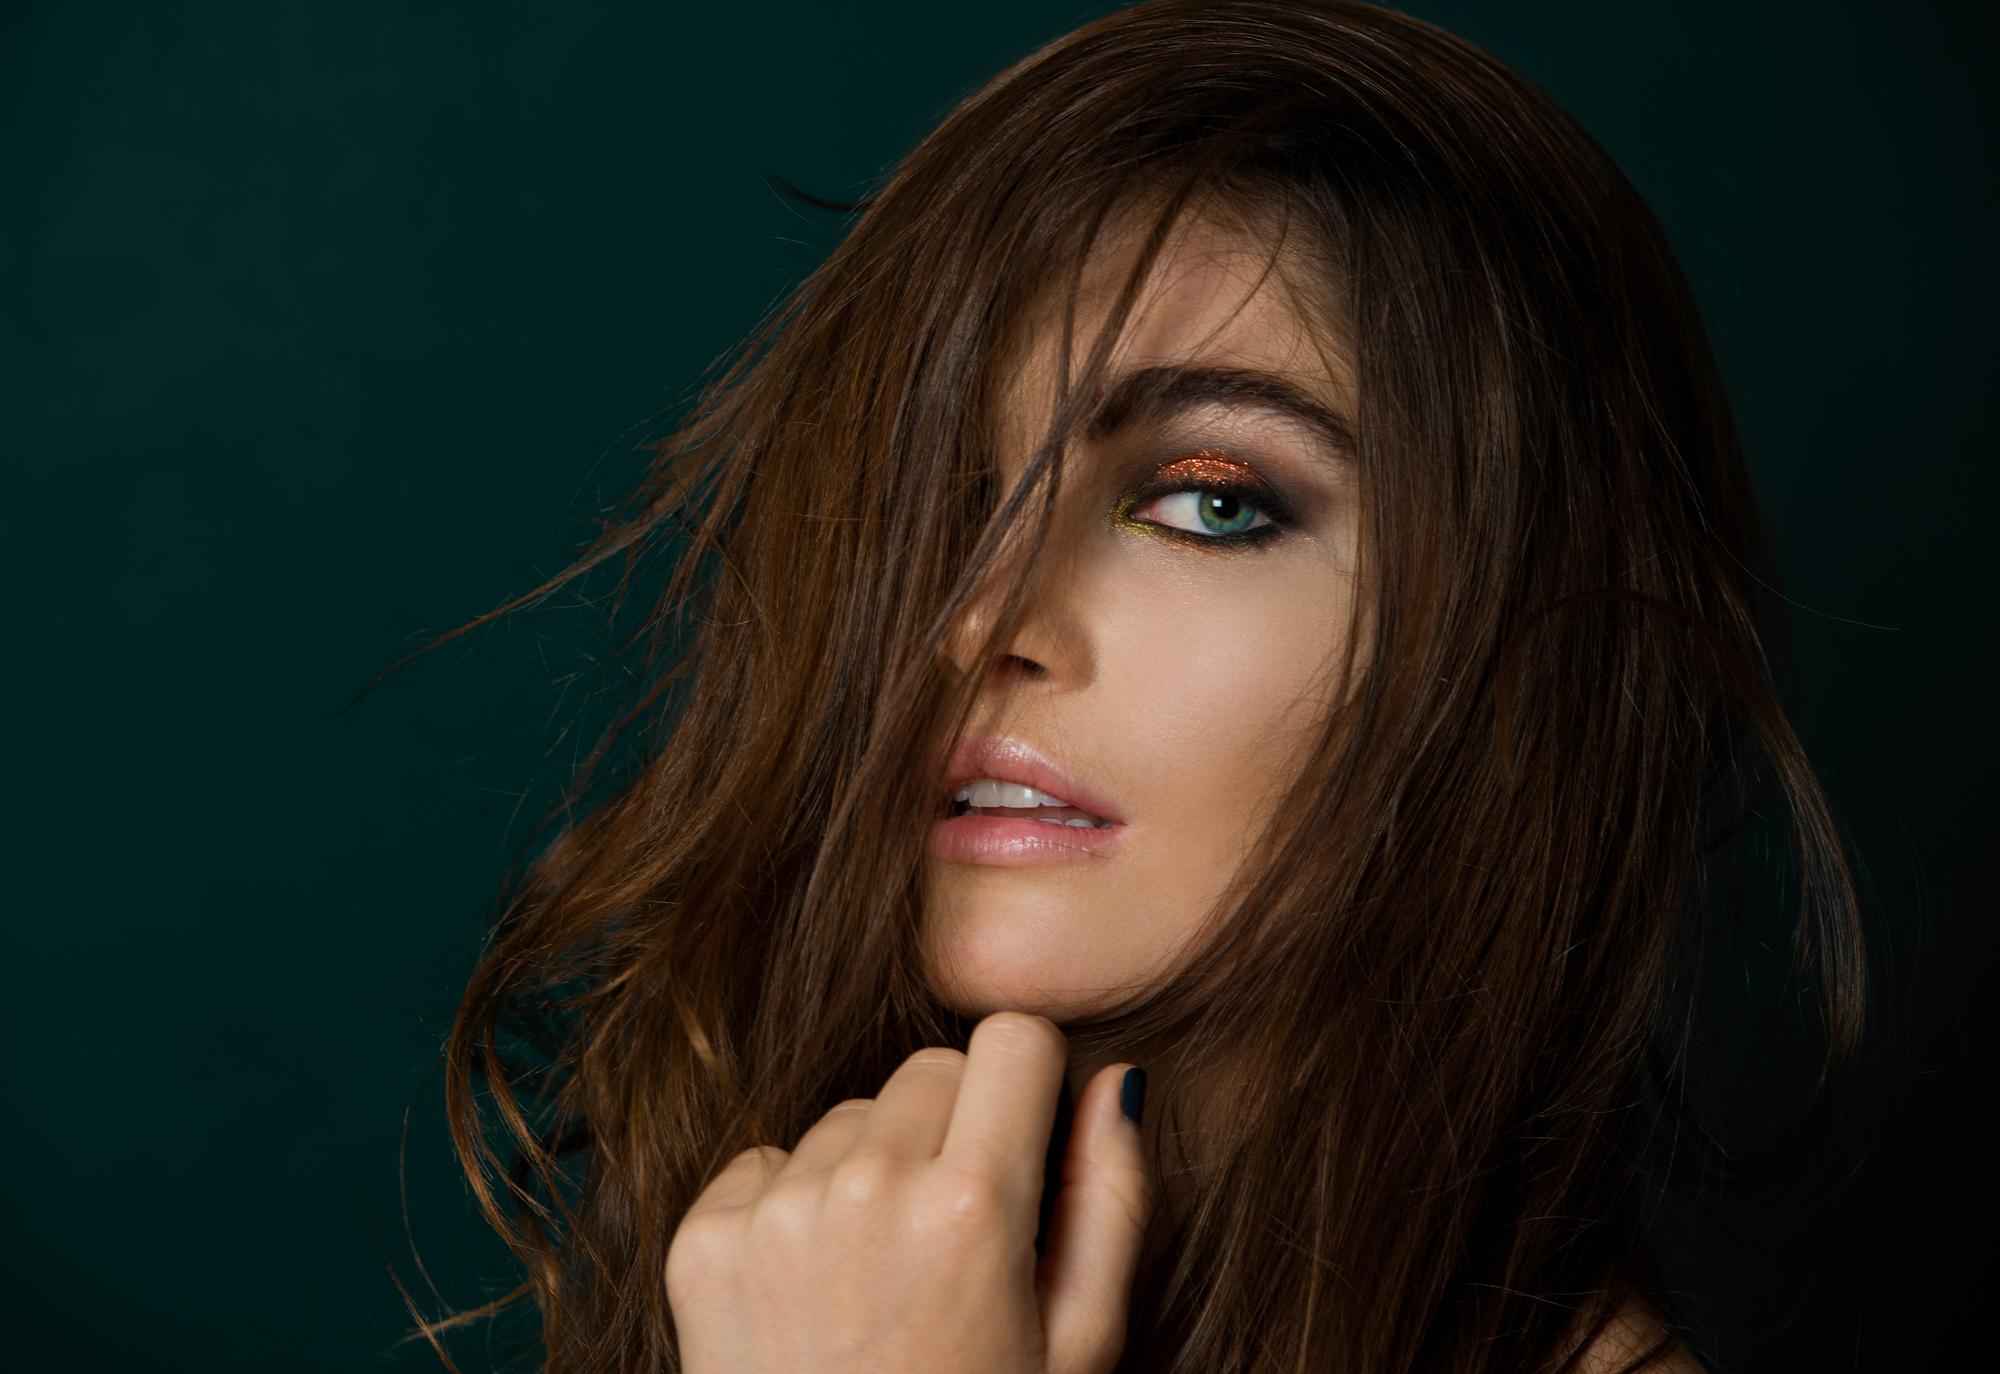 Samantha-Digiacomo-356_cc-edit_grn2